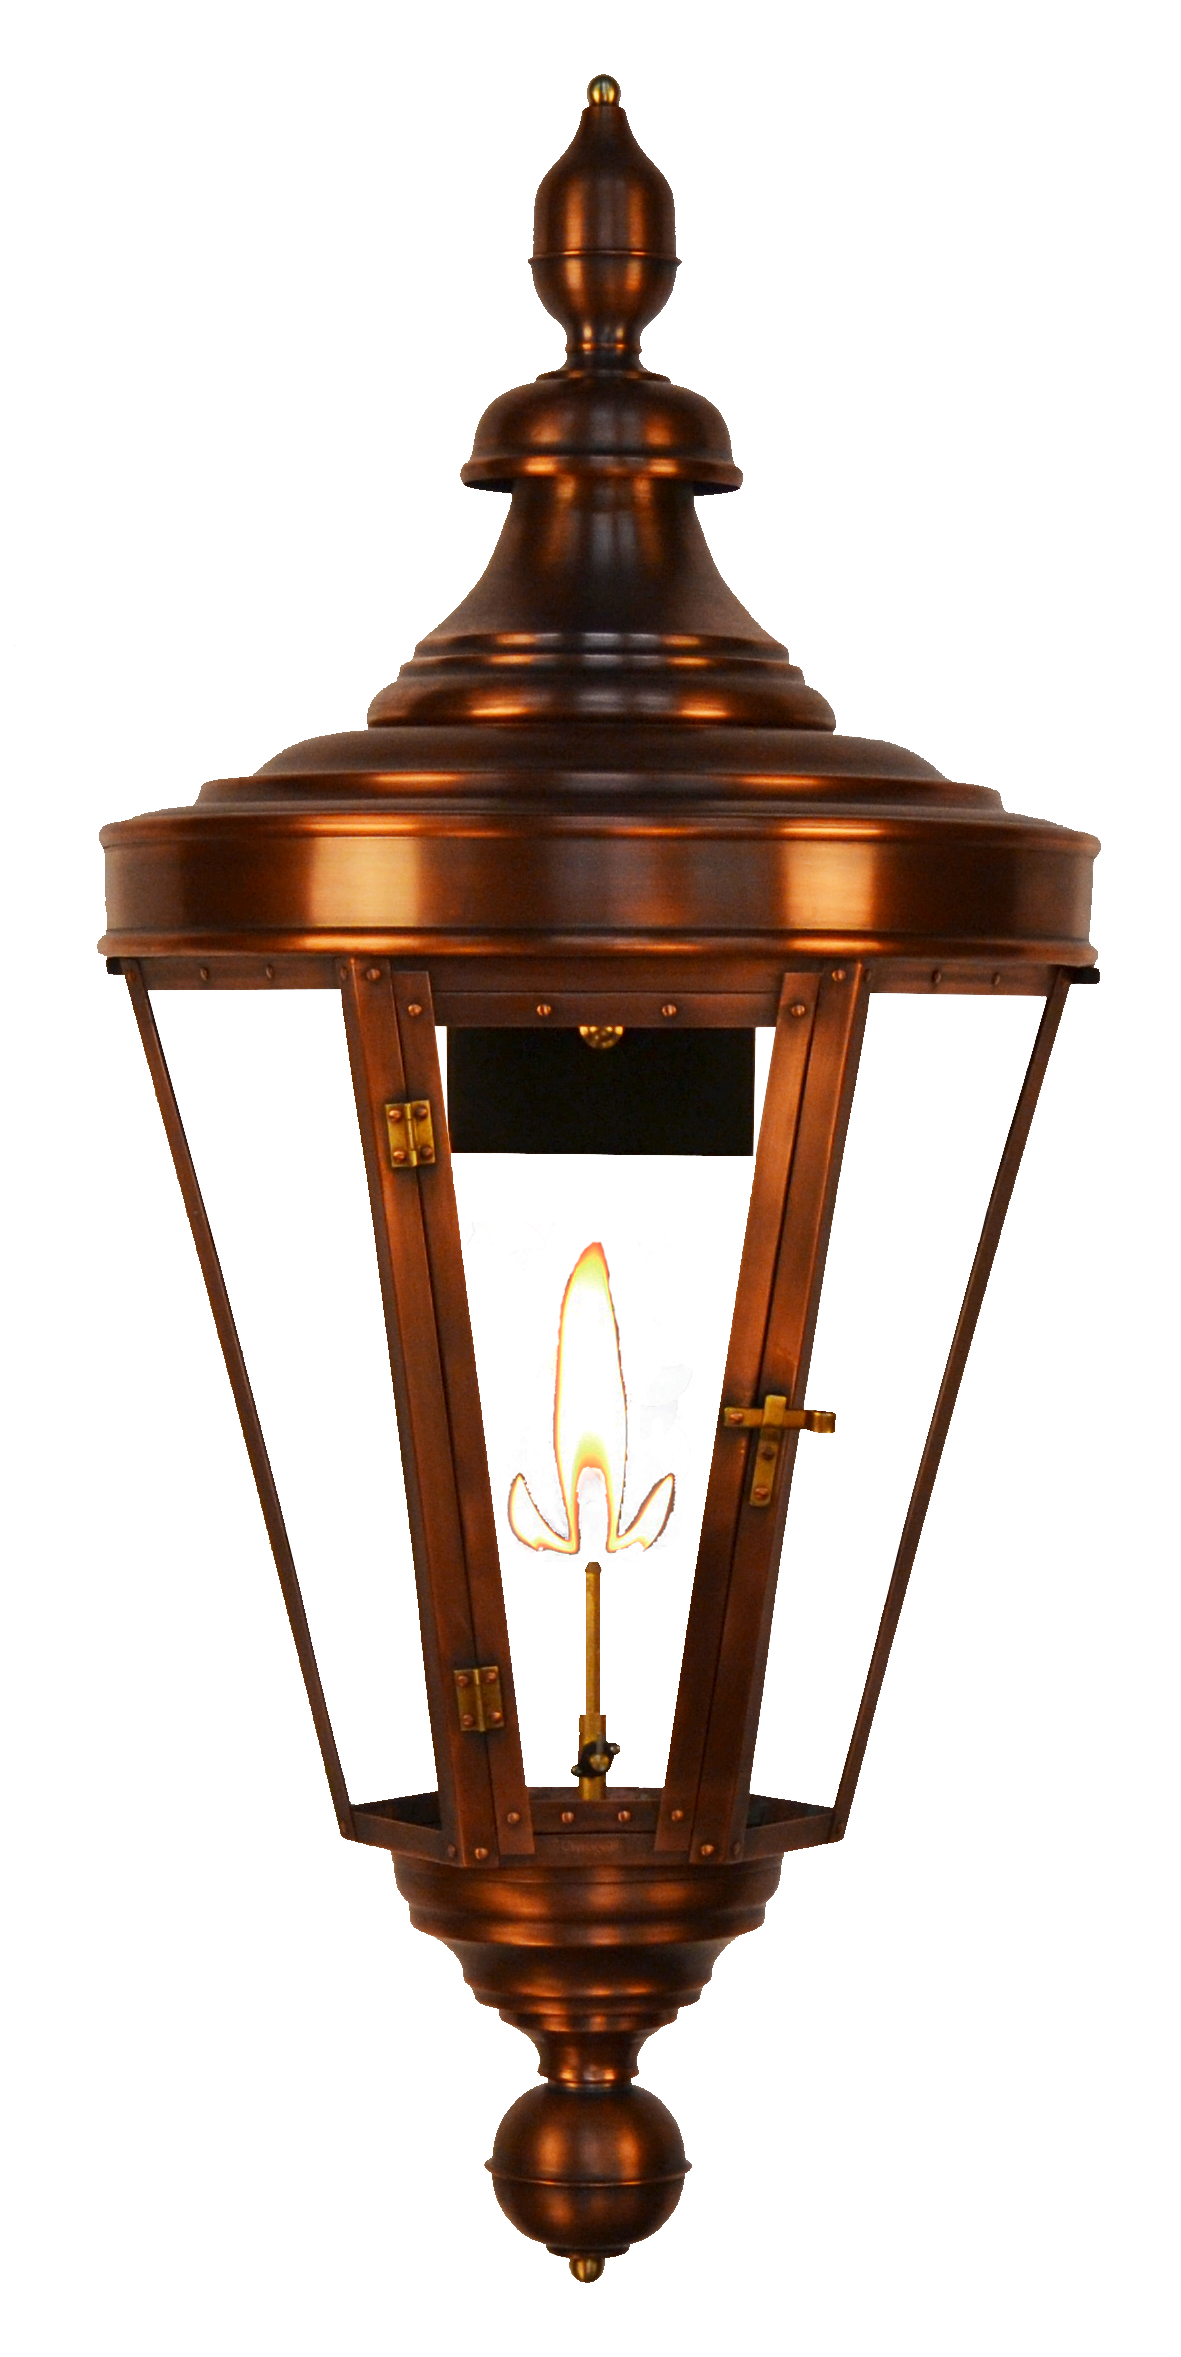 Royal Street Lantern - French Market Lanterns